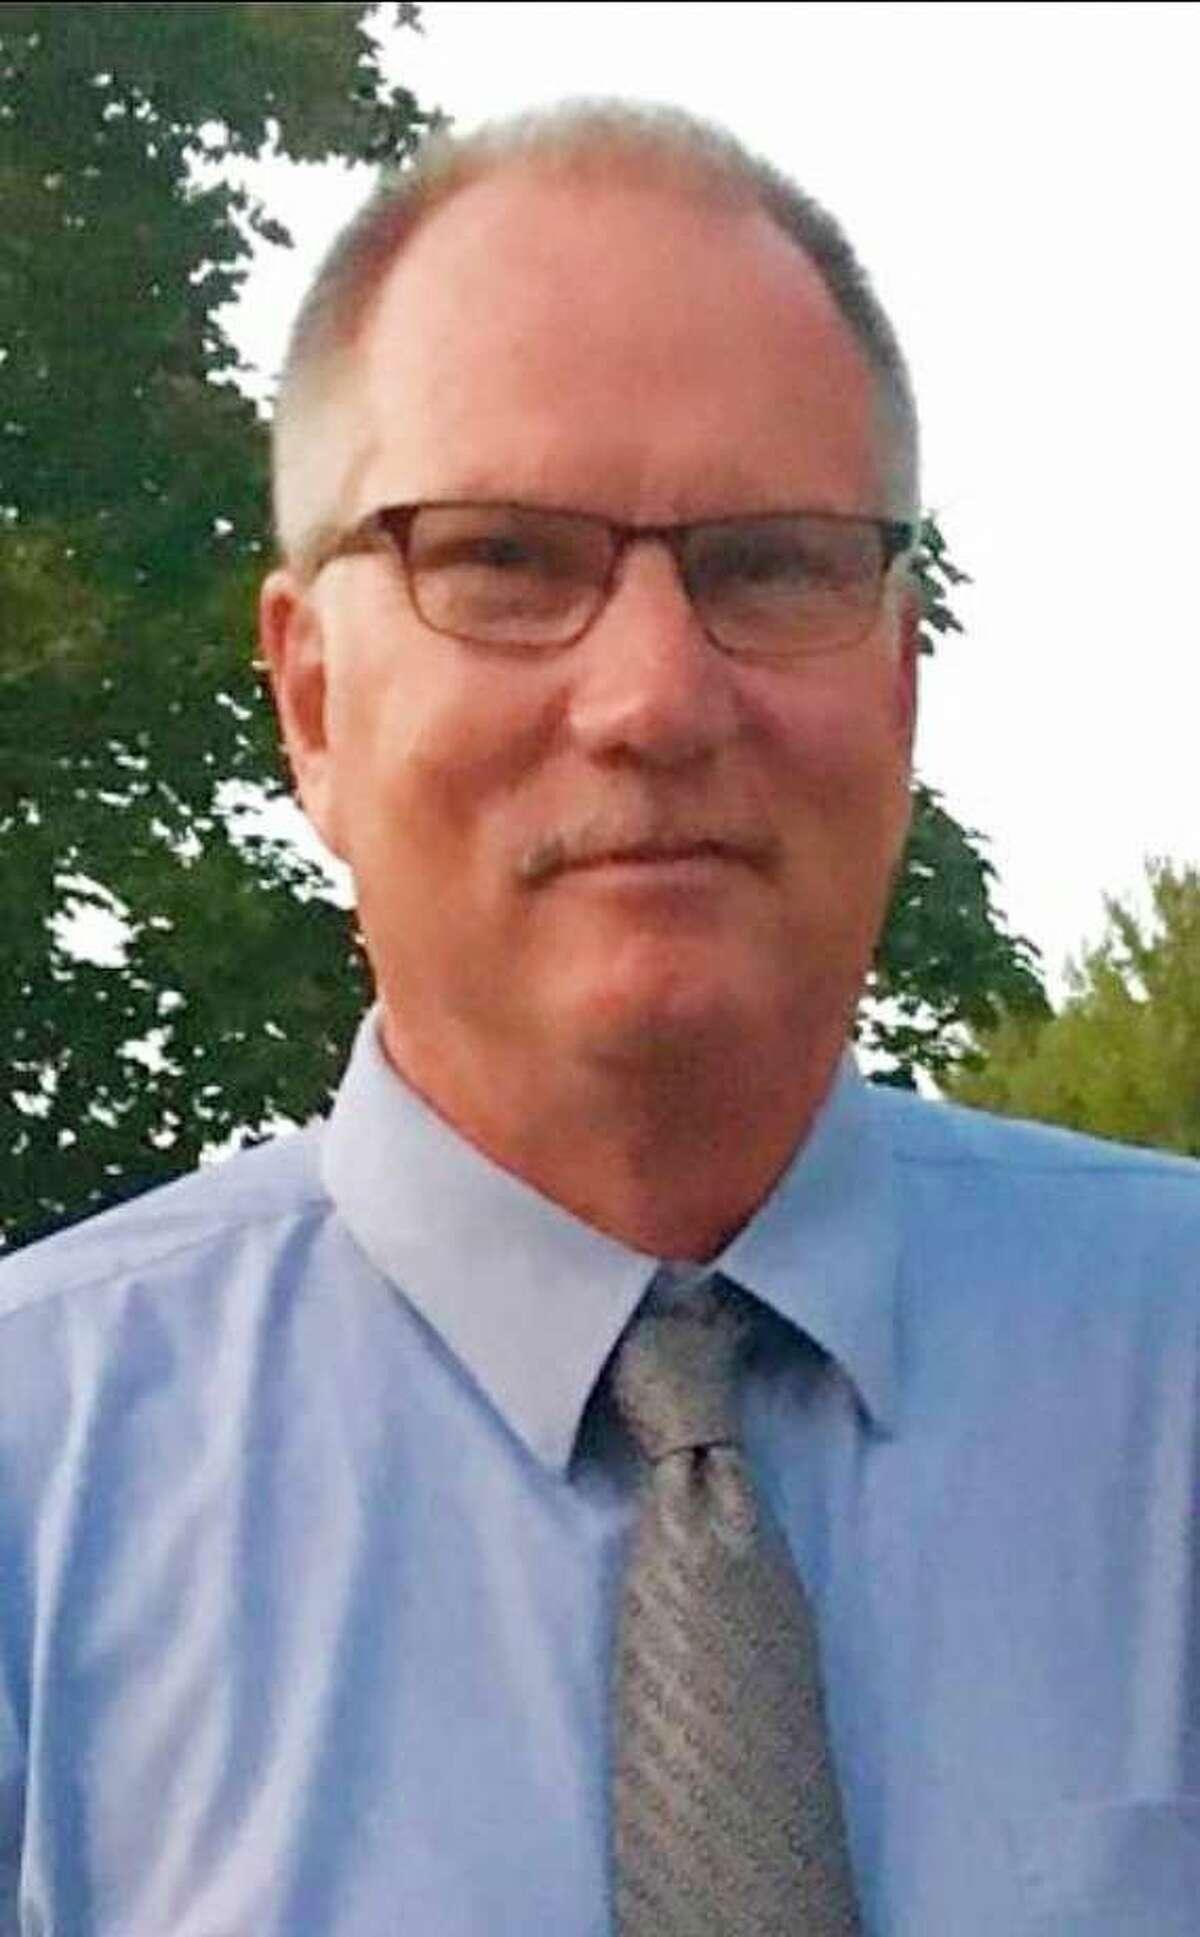 Commissioner Ron Wruble (Tribune File Photo)